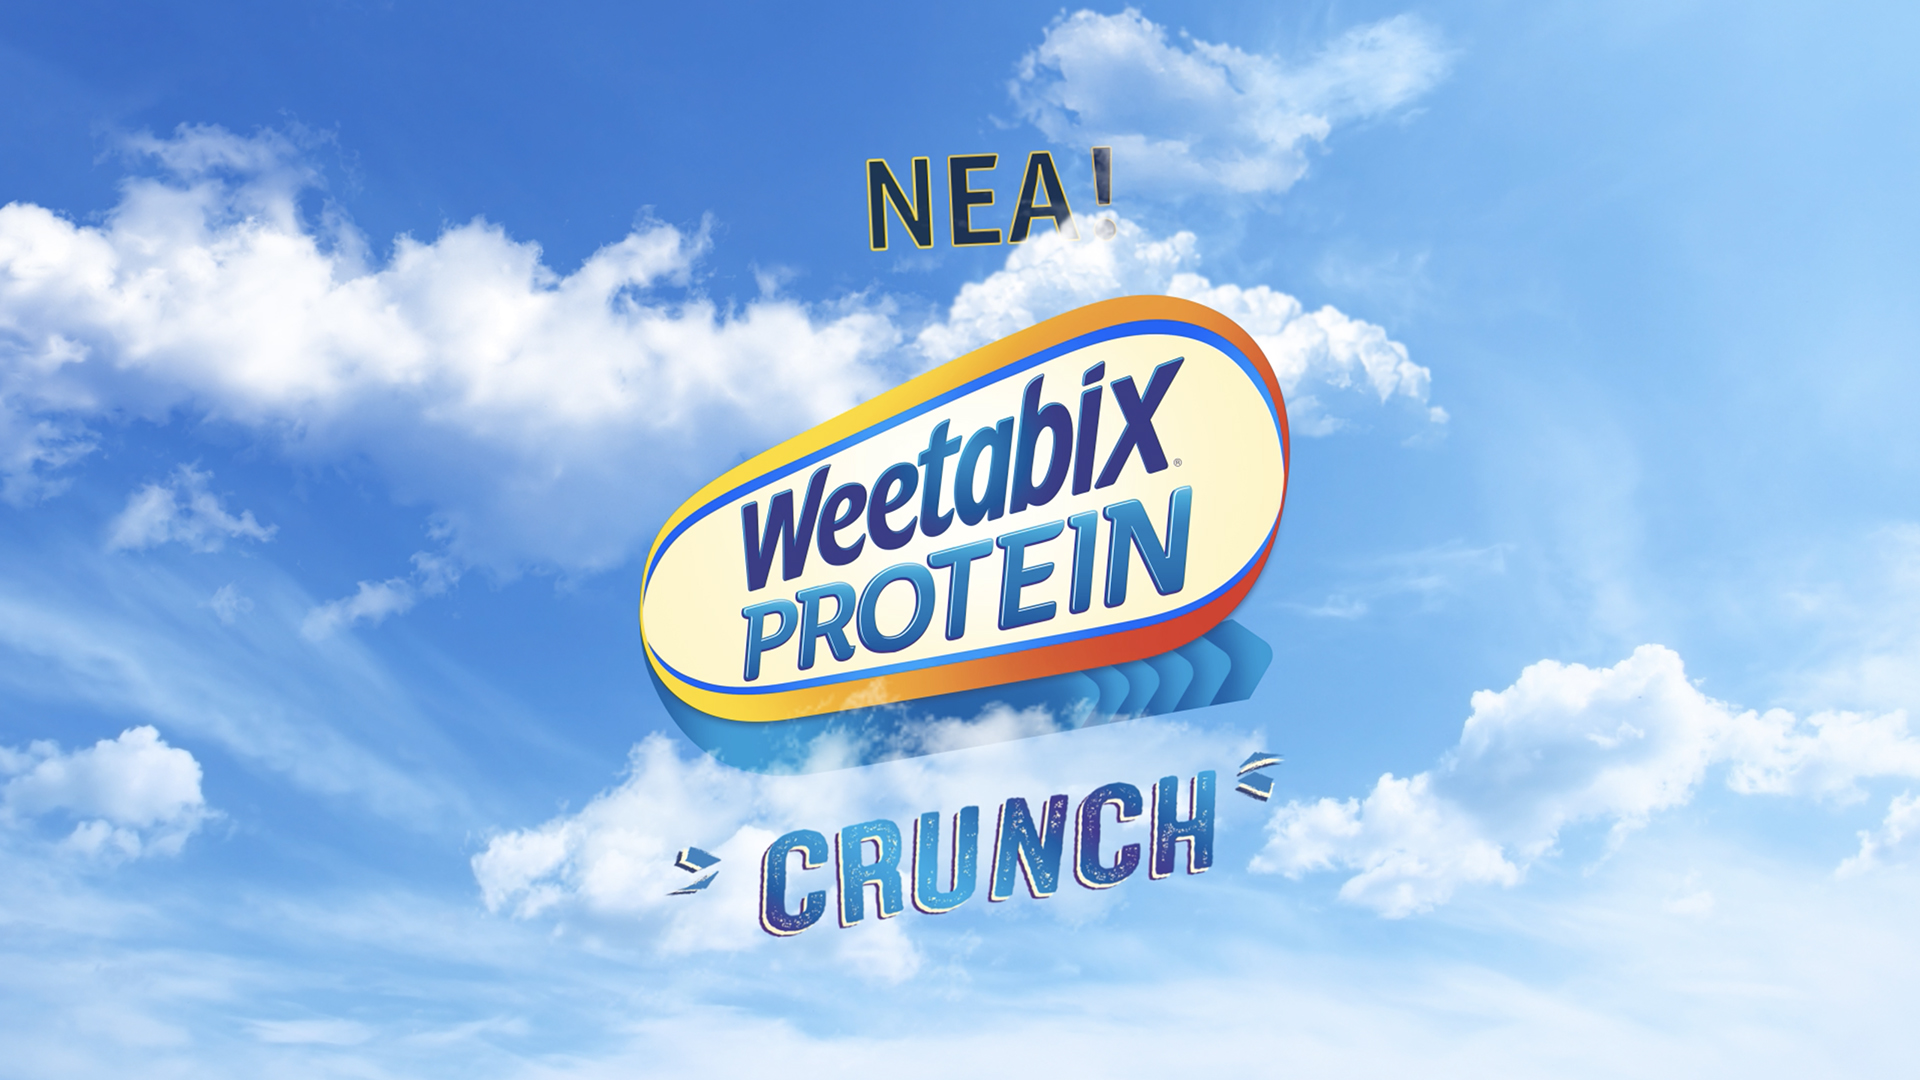 WEETABIX CRUNCH AD